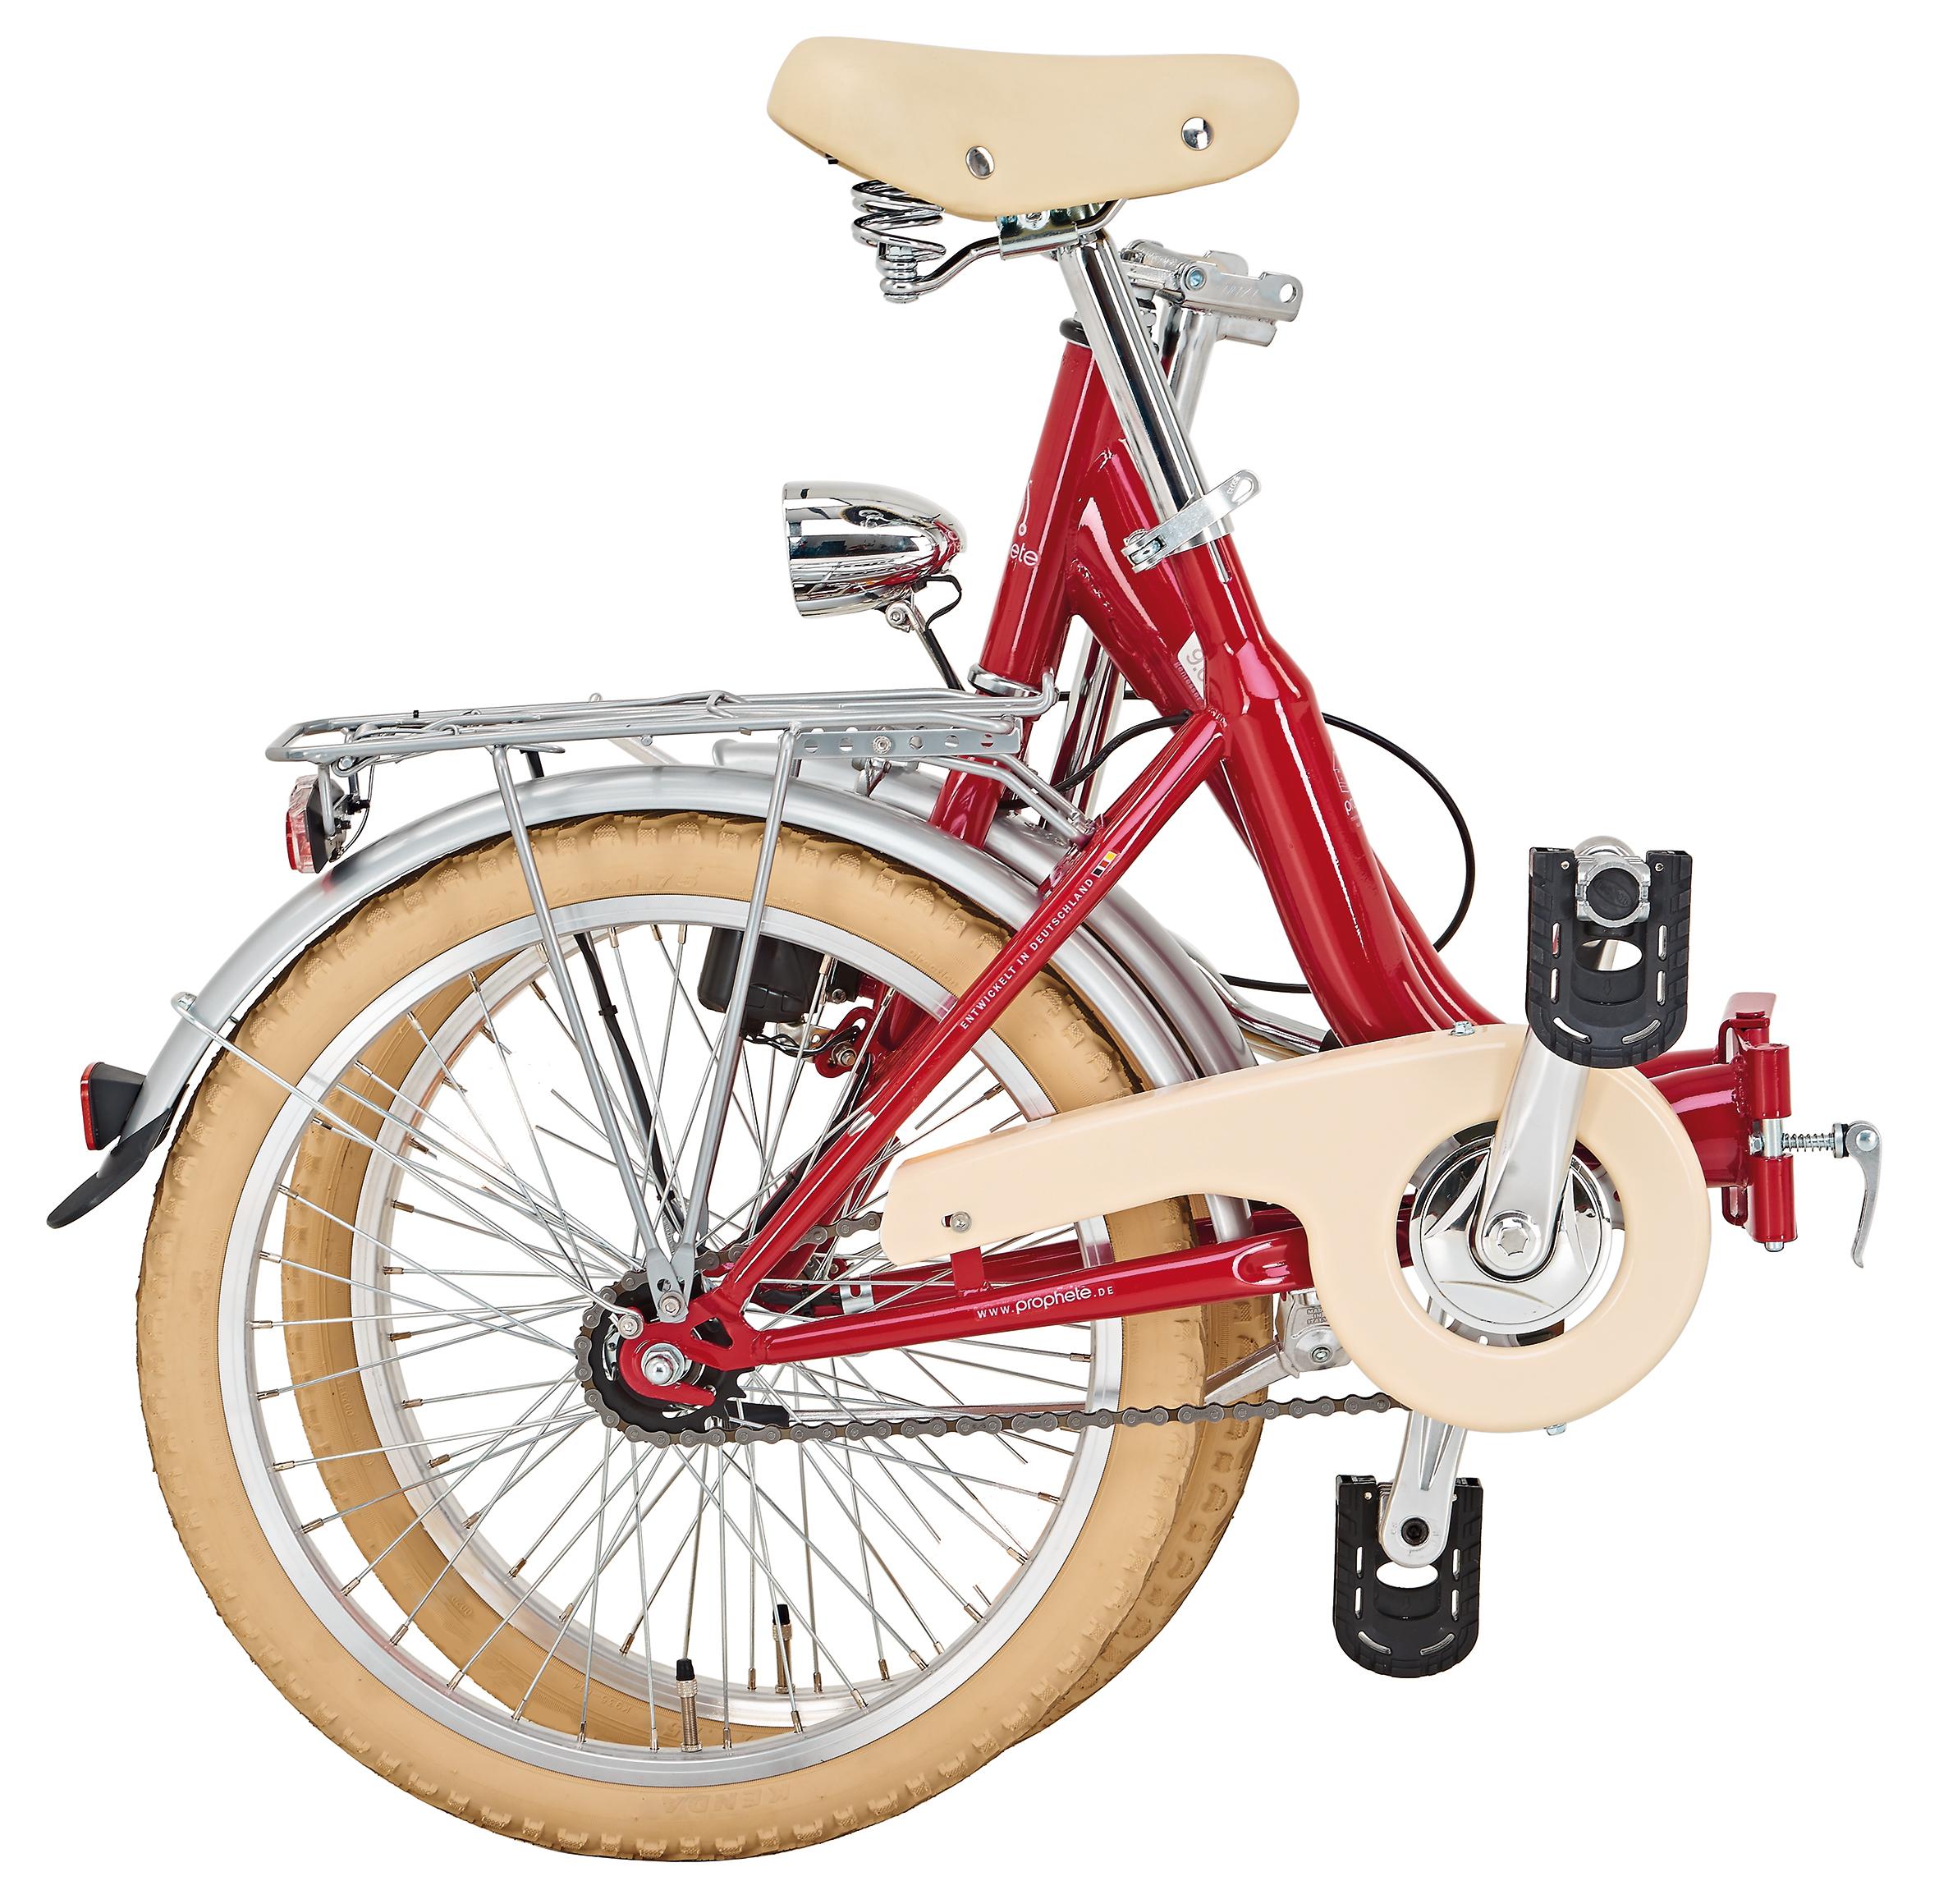 "Prophete City Faltrad Geniesser 9.0 City Bike 20"" Bild 3"